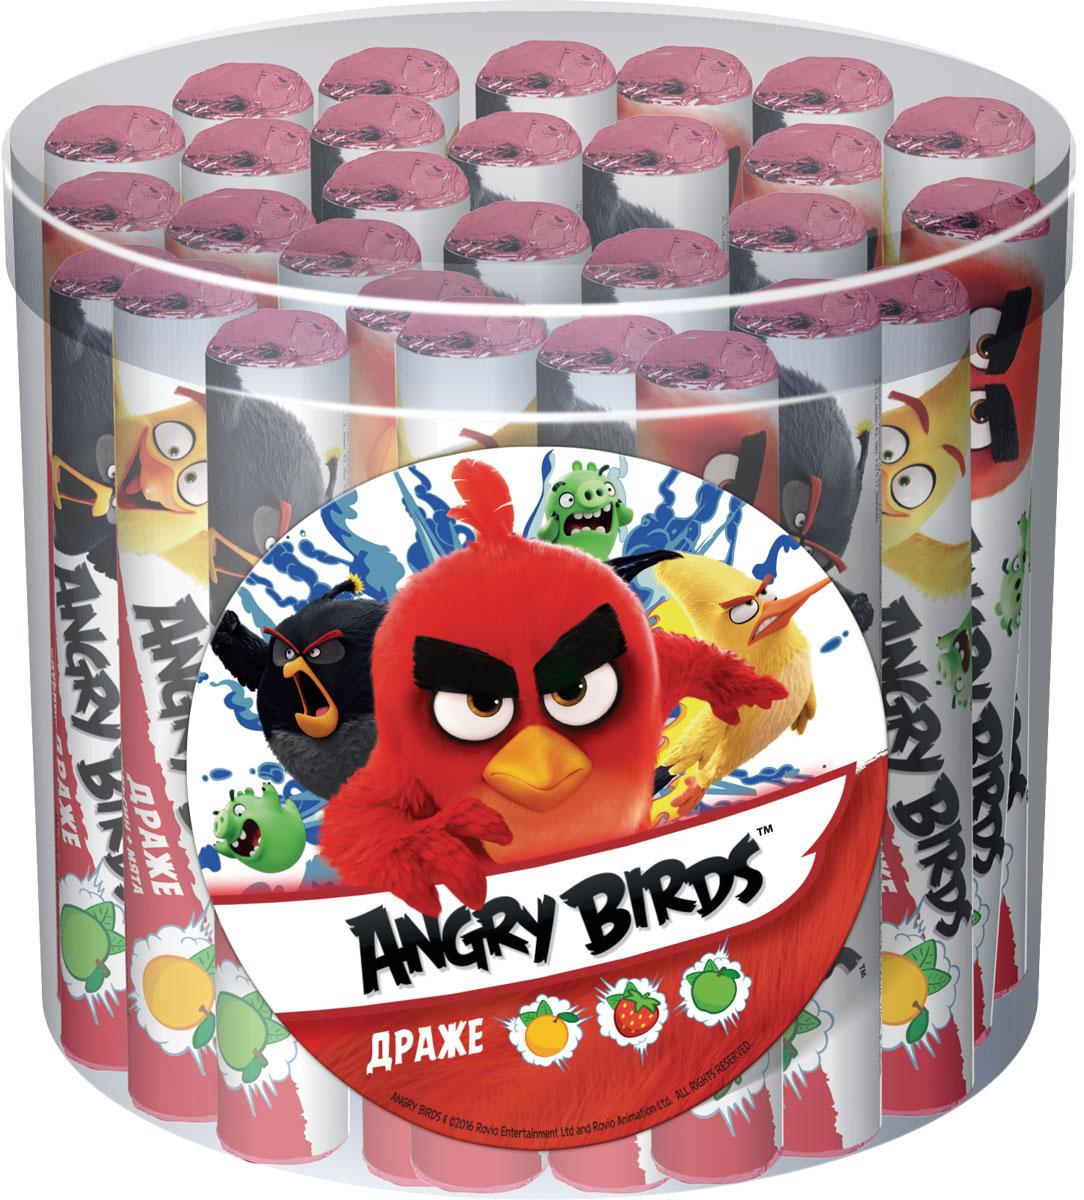 Angry Birds Movie драже освежающее, 24 шт по 24 гУТ18476Освежающее драже со вкусом мяты и апельсина, со вкусом мяты и клубники, со вкусом мяты и яблока.